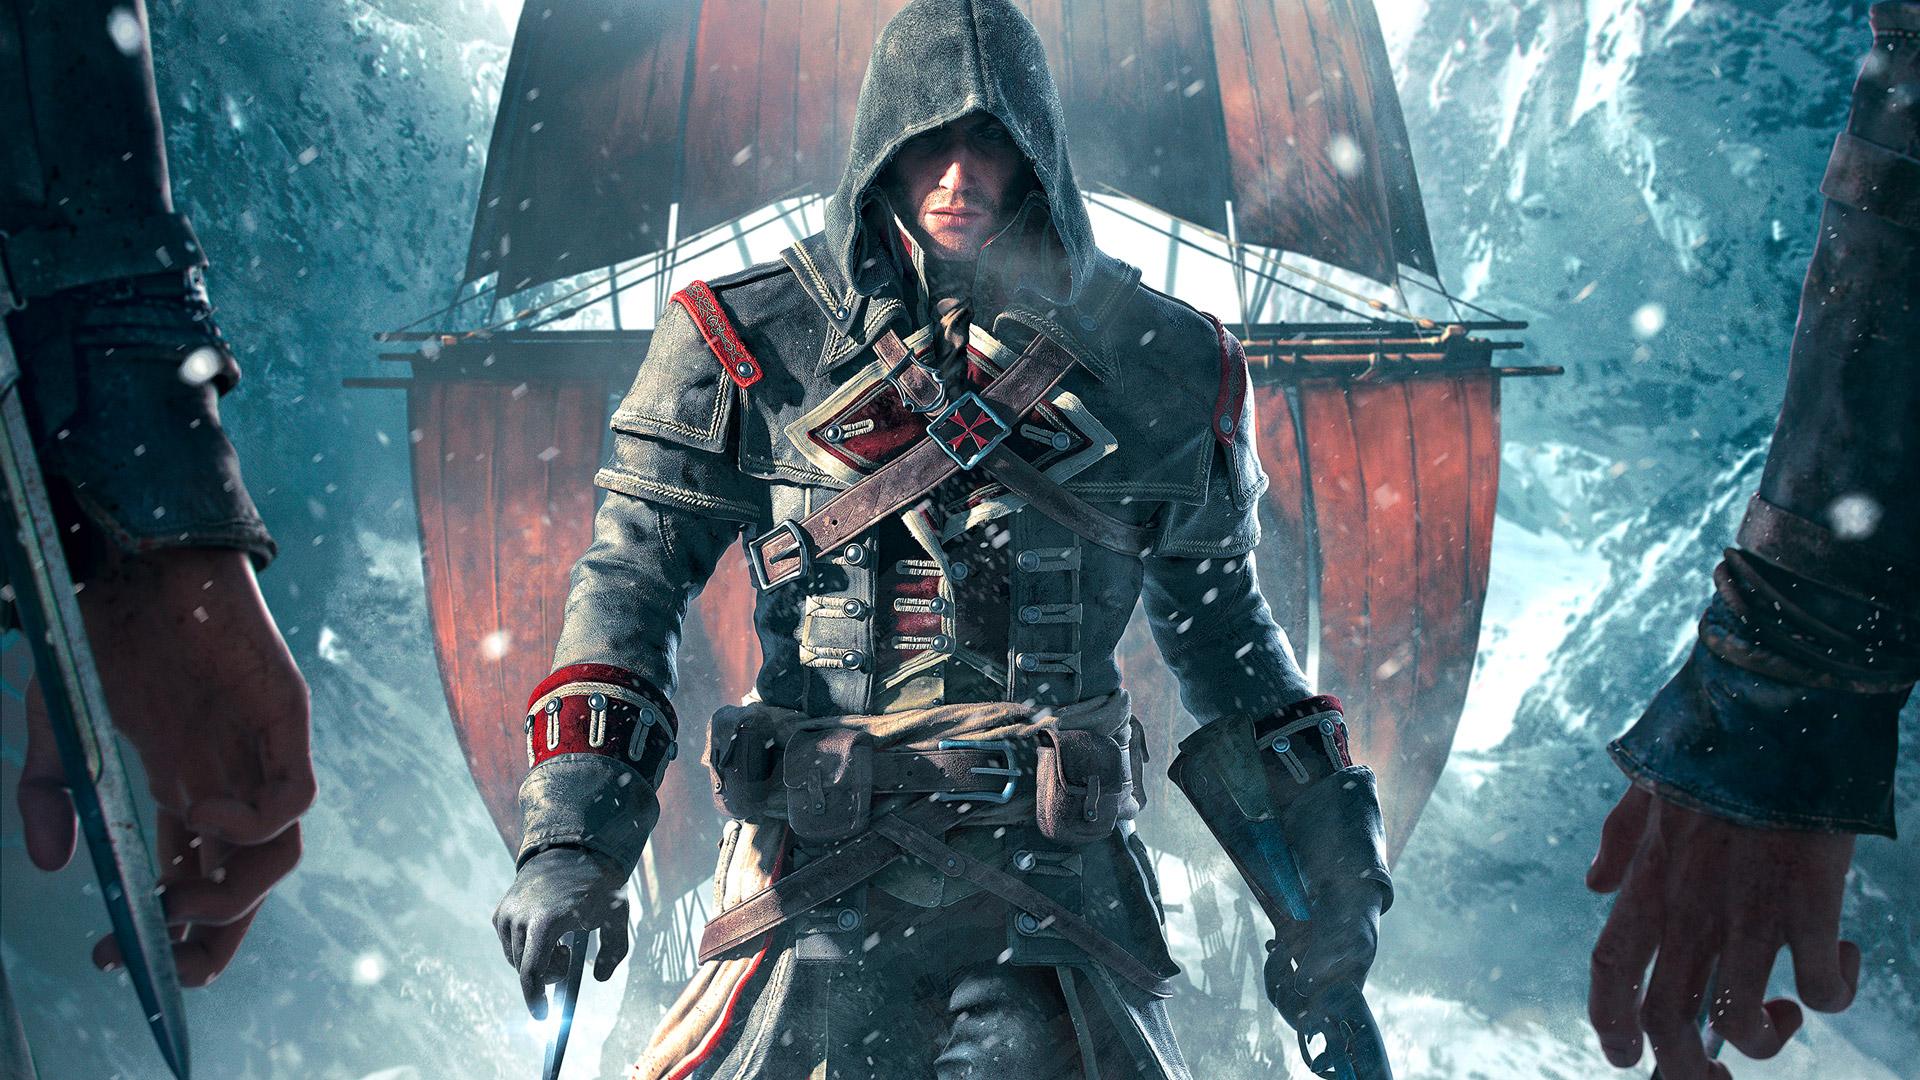 Assassins Creed Rogue Wallpaper in 1920x1080 1920x1080